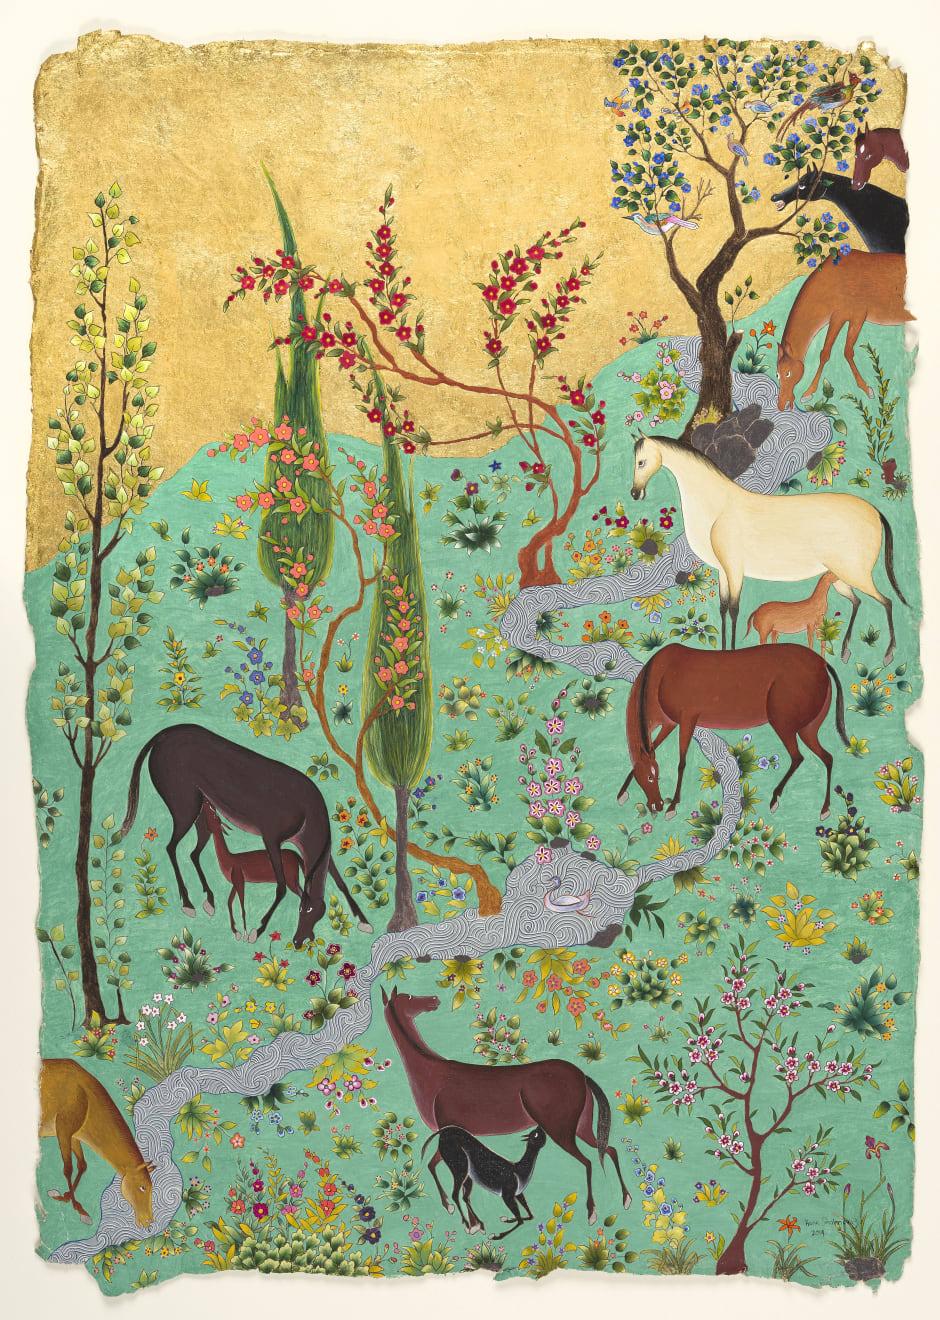 Hana Shahnavaz, A Meadow for Shabdiz , 2020